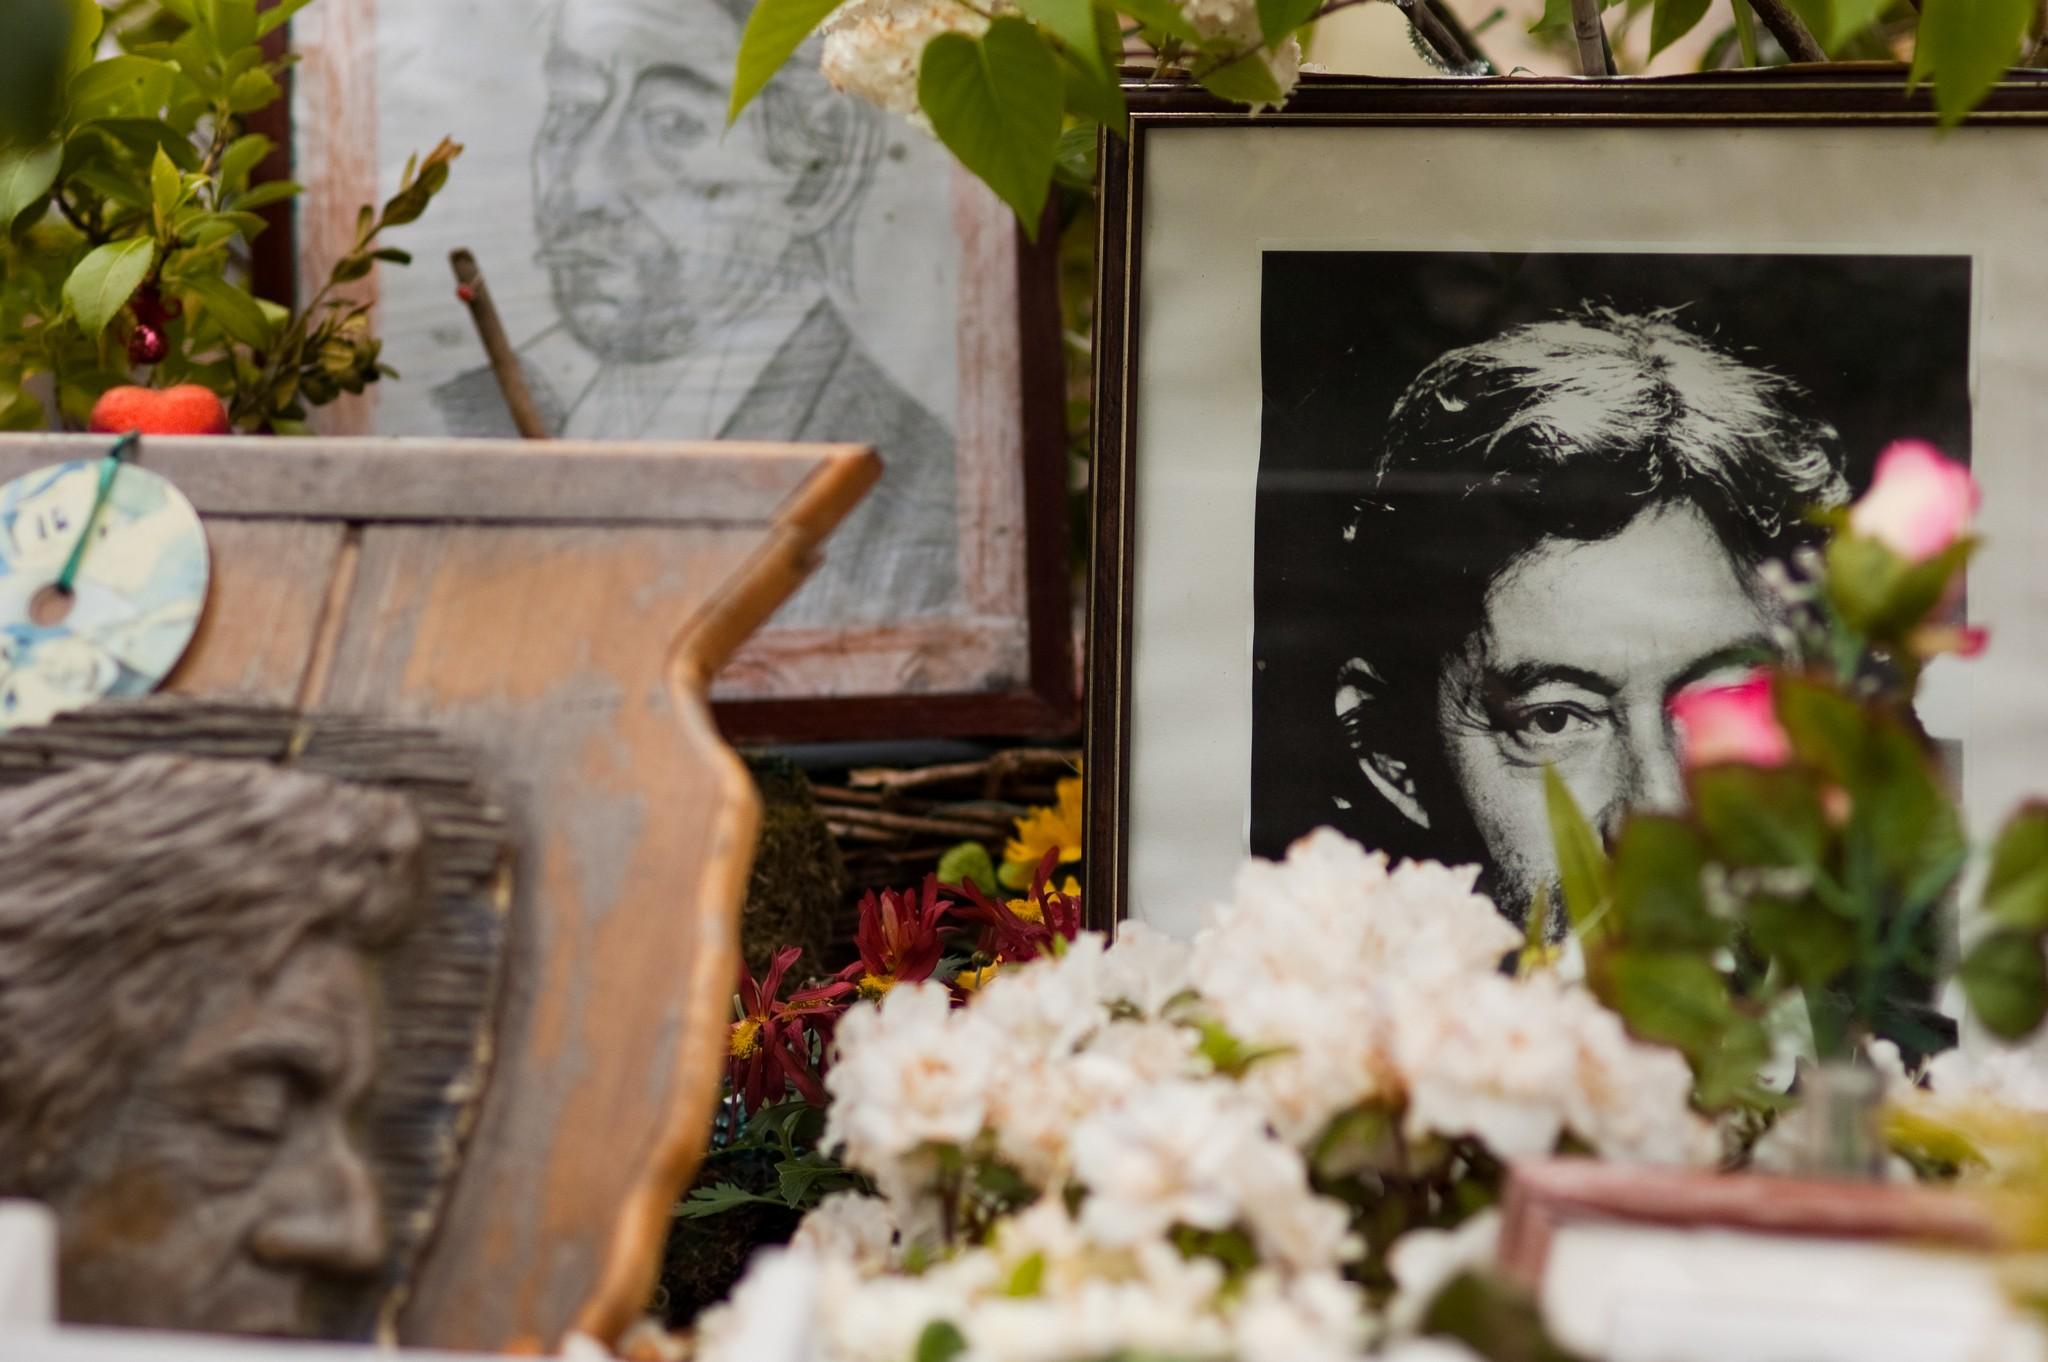 Grab von Serge Gainsbourg, Cimetière du Montparnasse, Paris, Mai 2009